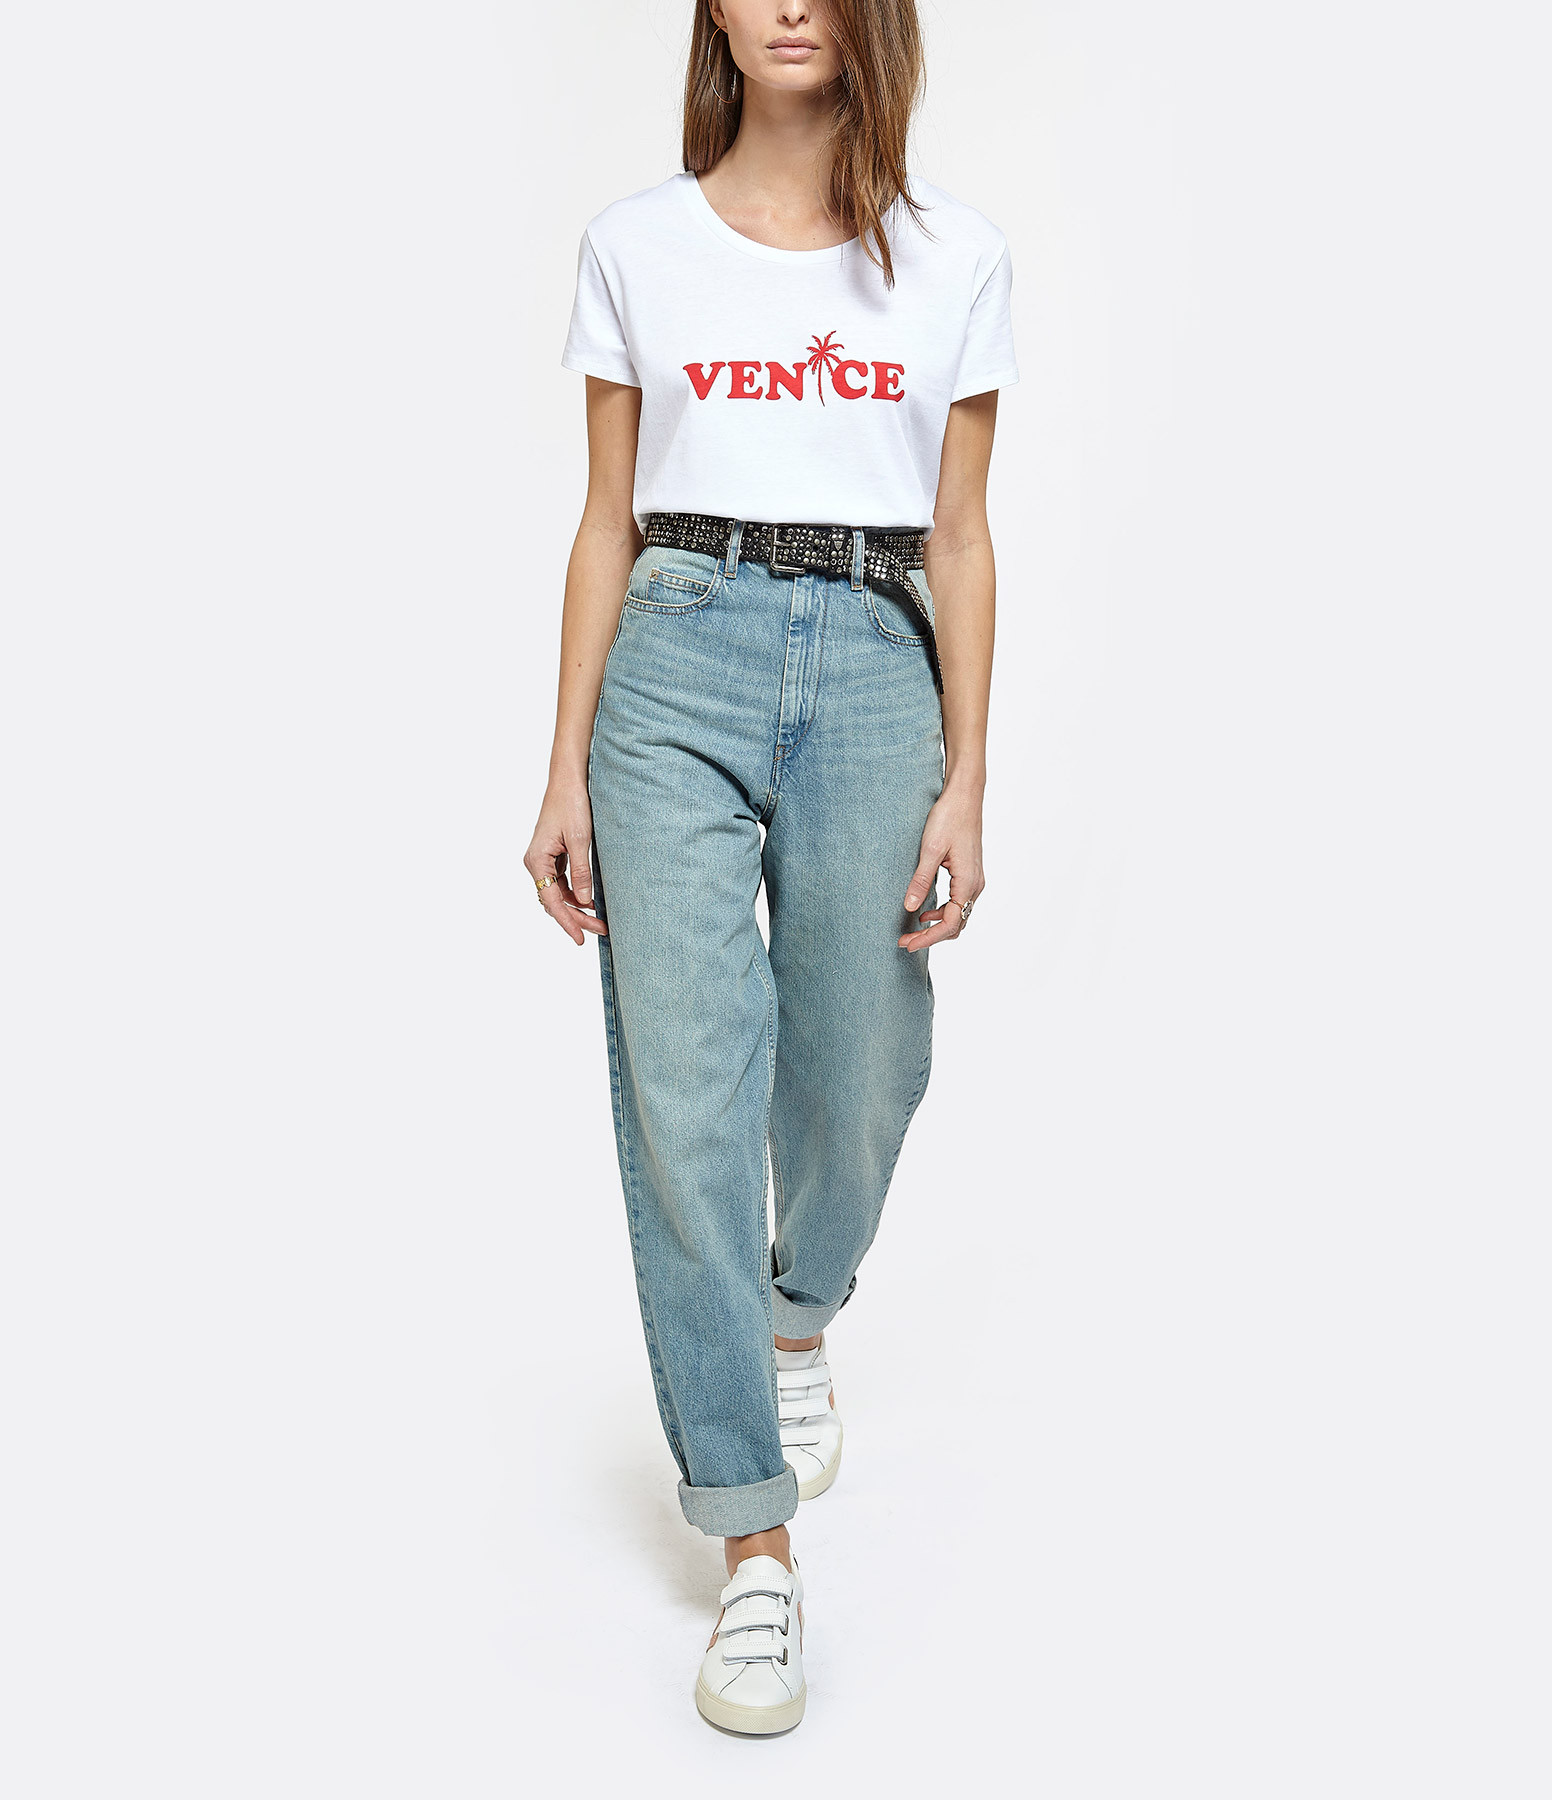 JEANNE VOULAND - Tee-Shirt Devon Venice Blanc